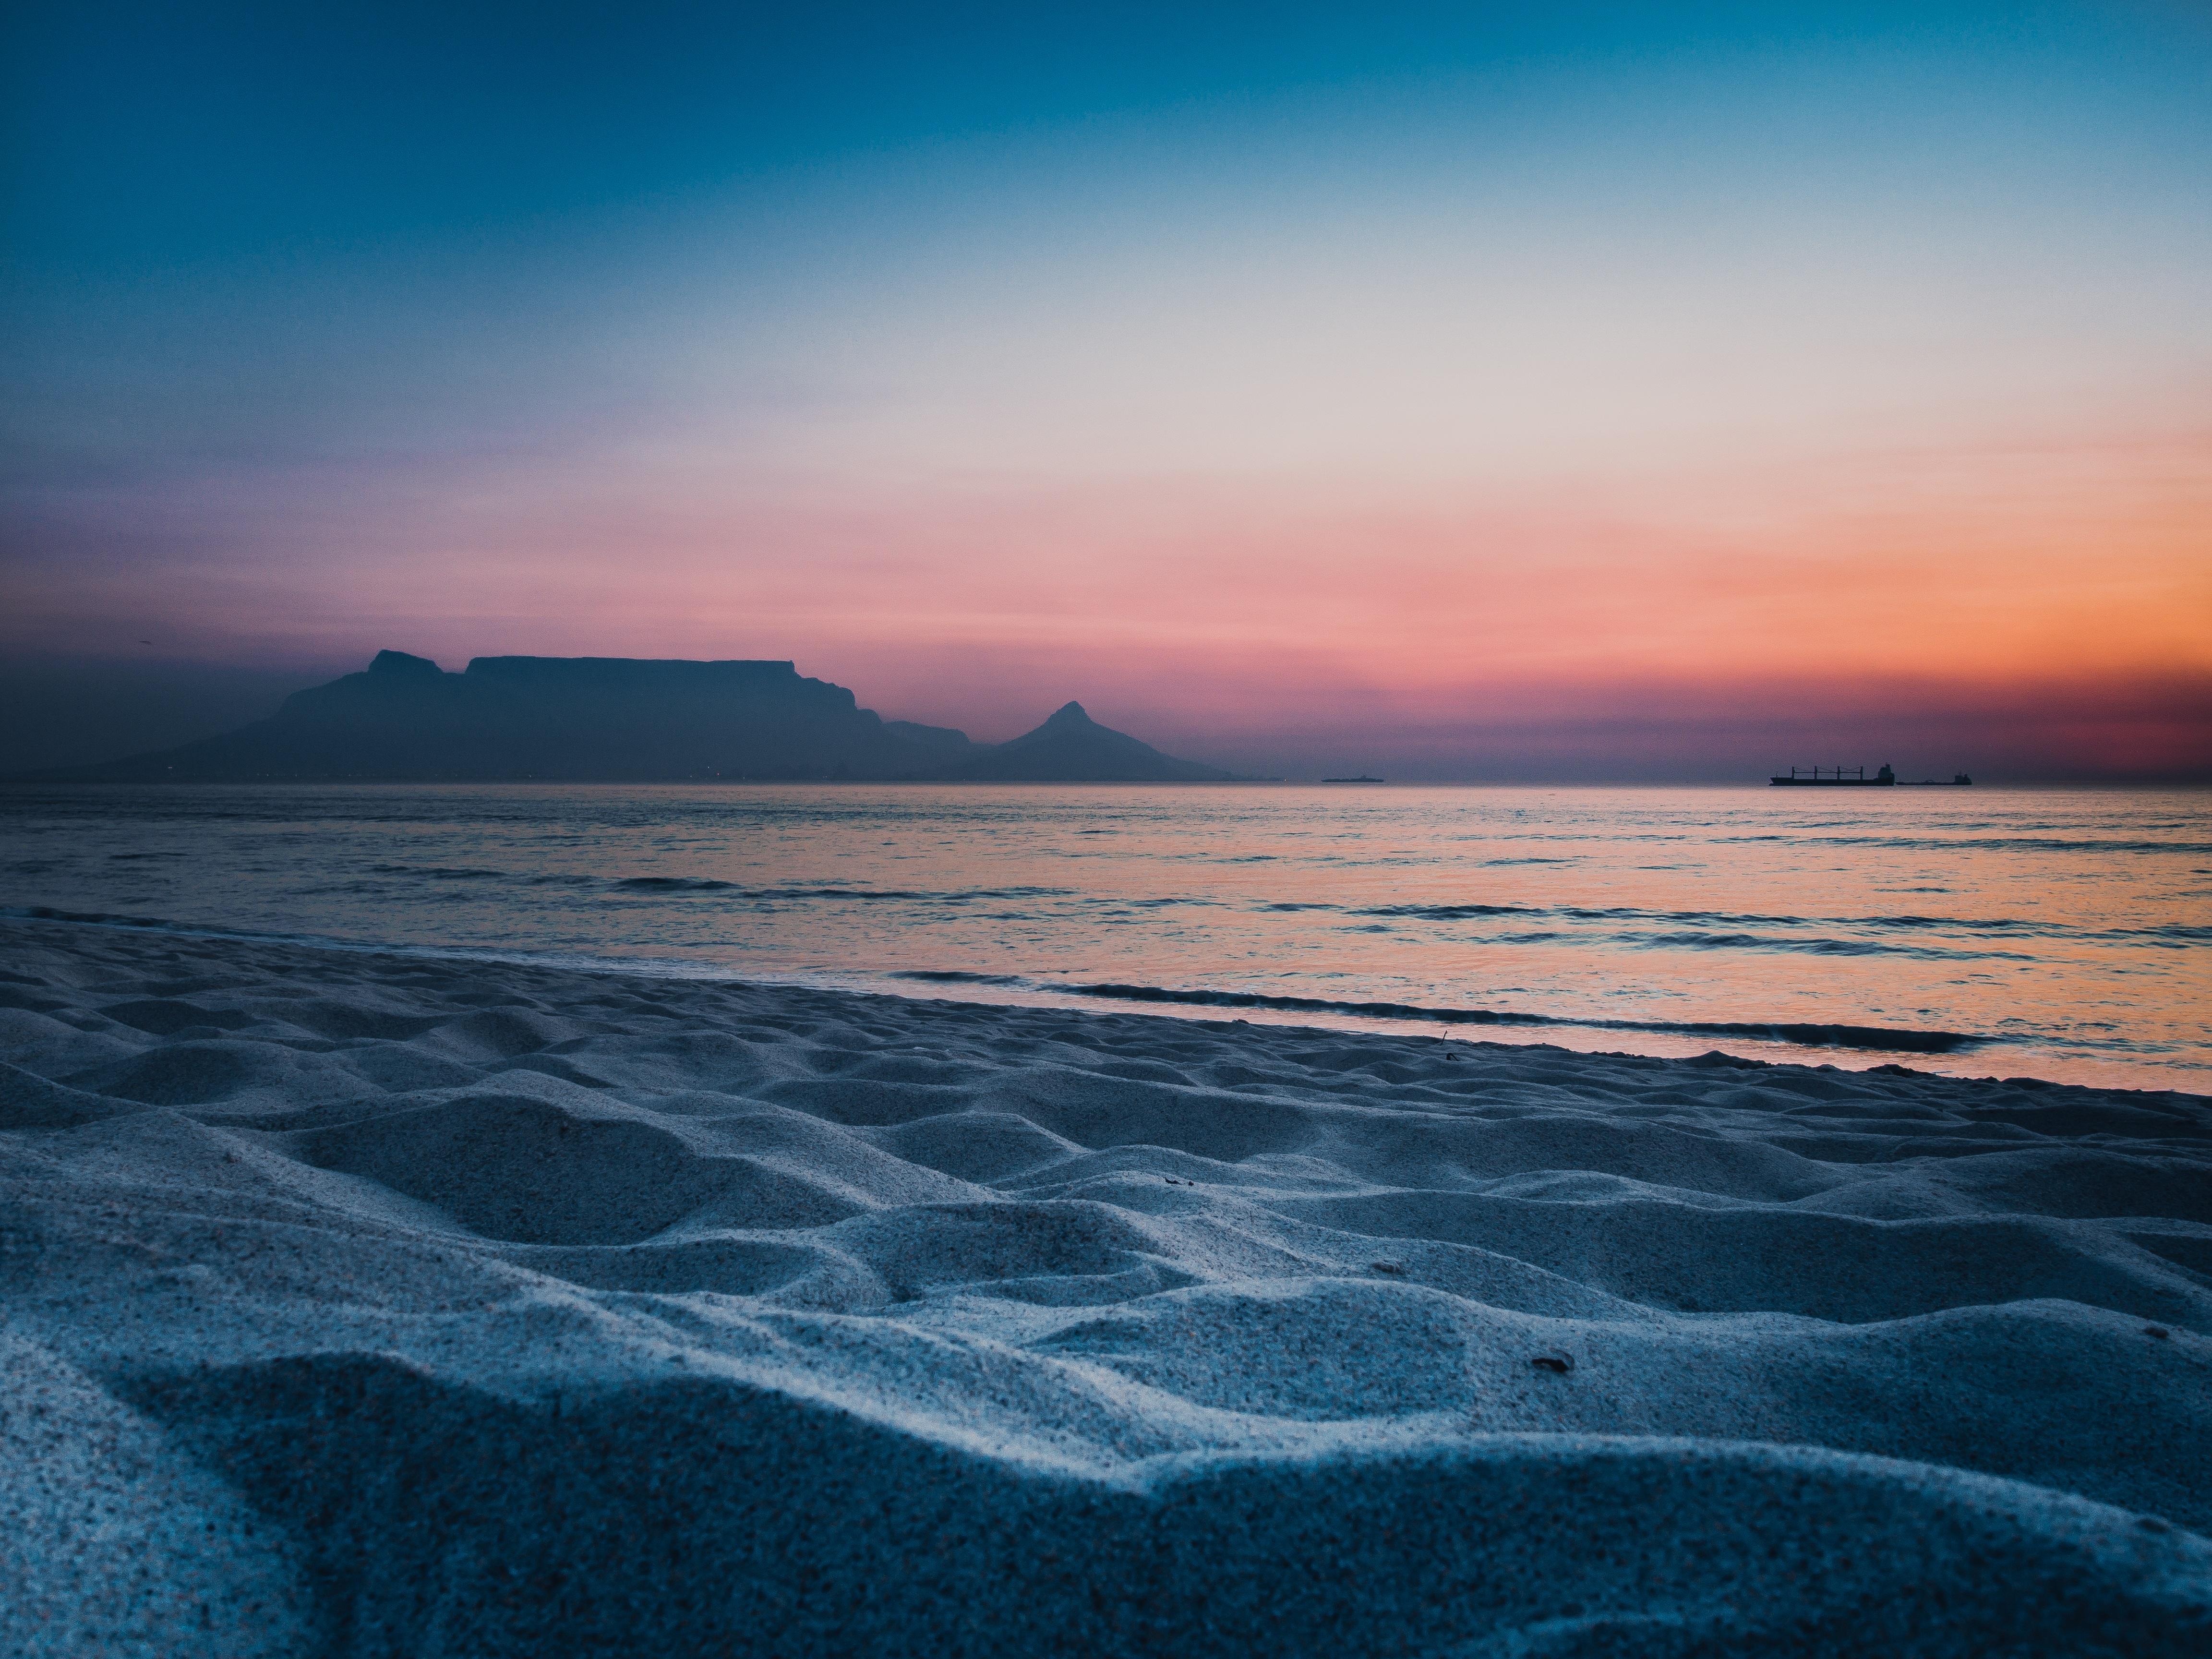 Free Images Beach Sea Coast Ocean Horizon Cloud Sky Sun Sunrise Sunset Sunlight Morning Shore Dawn Travel Dusk Heart Evening Reflection